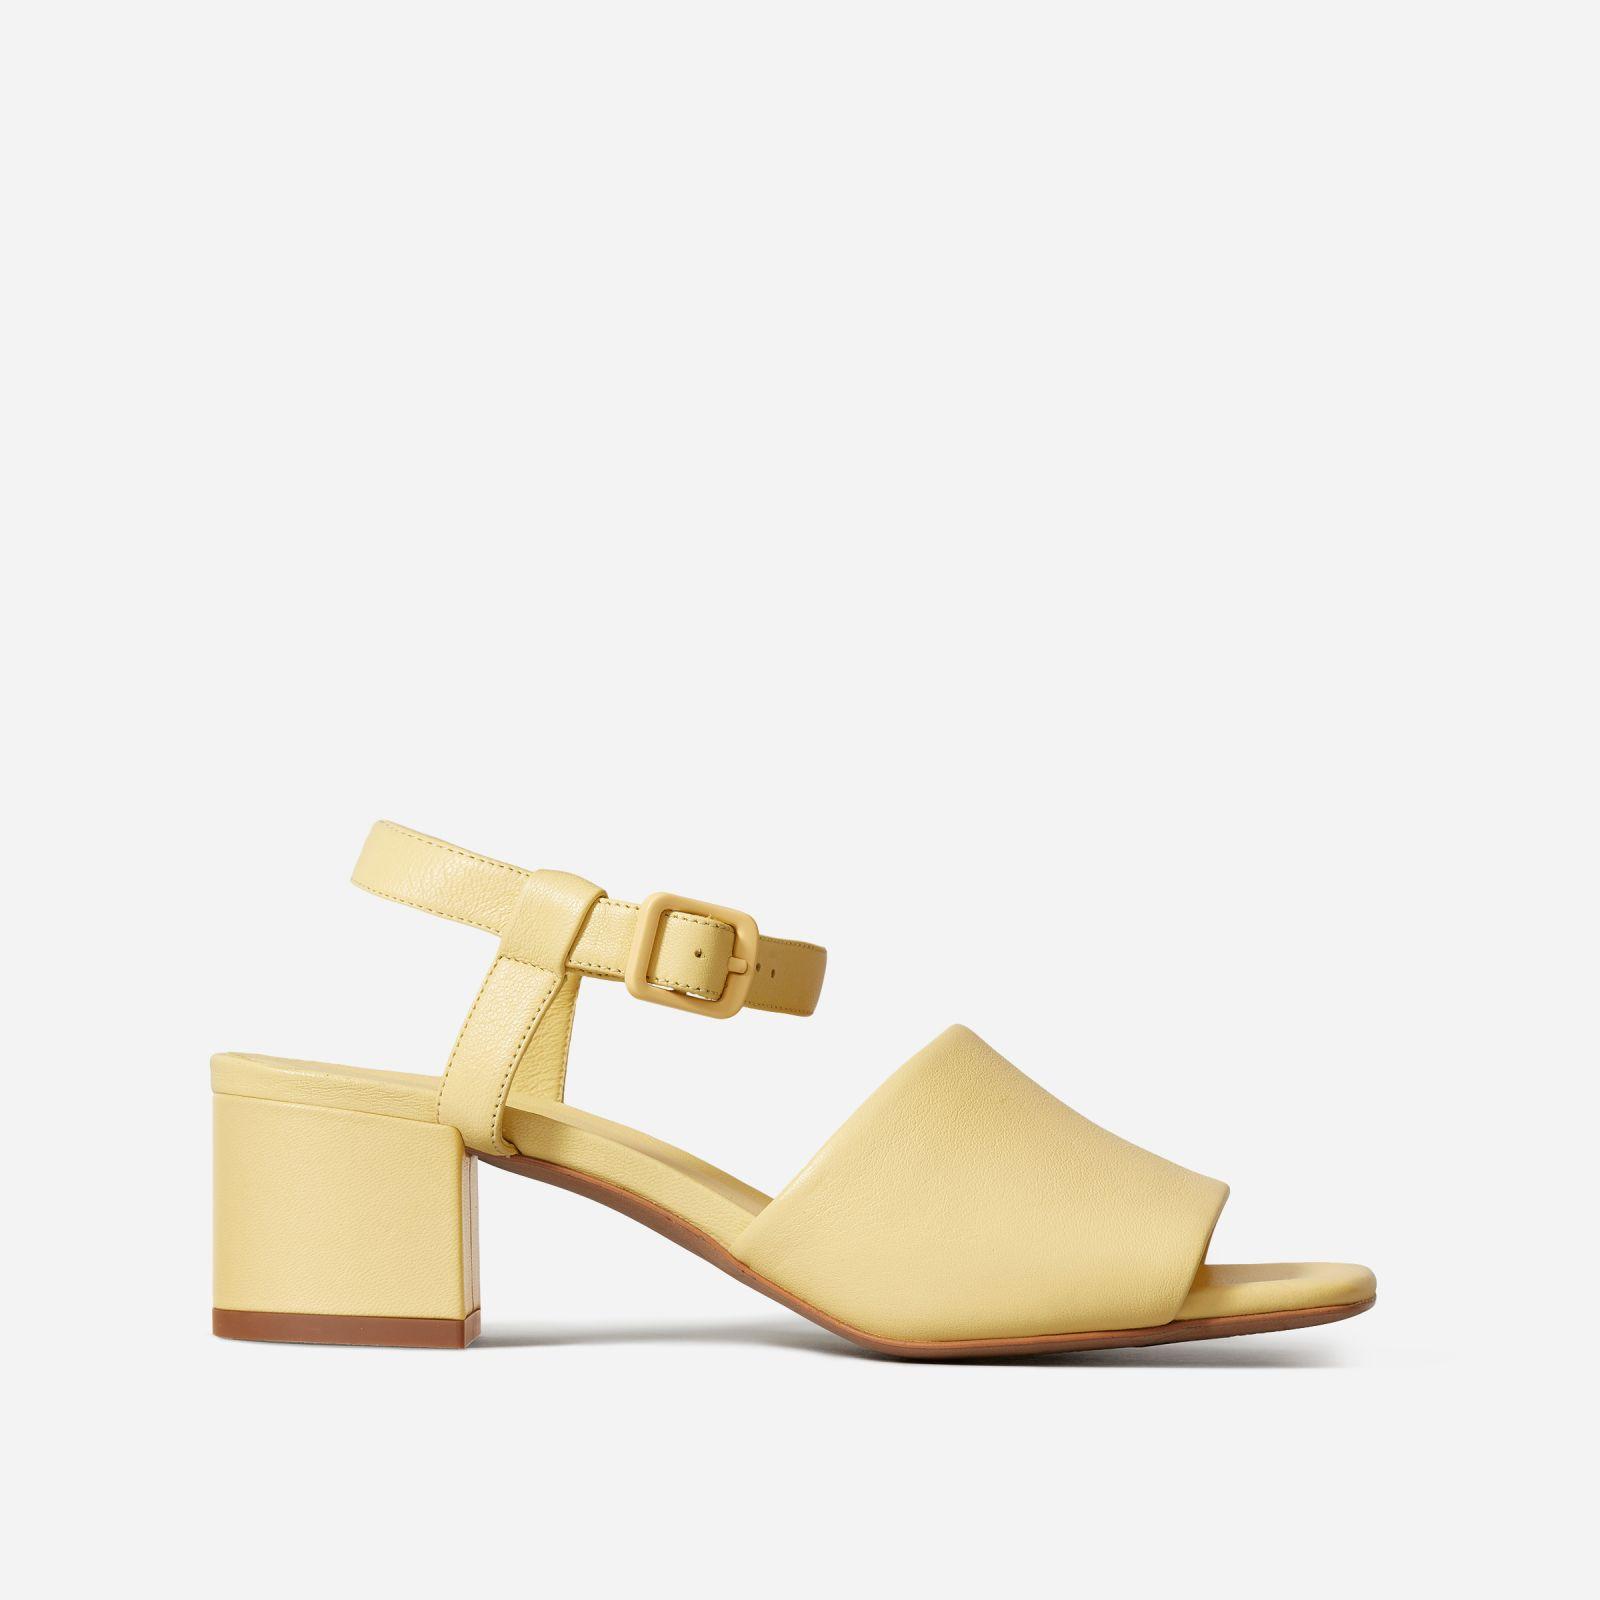 women's block heel sandal by everlane in canary, size 11